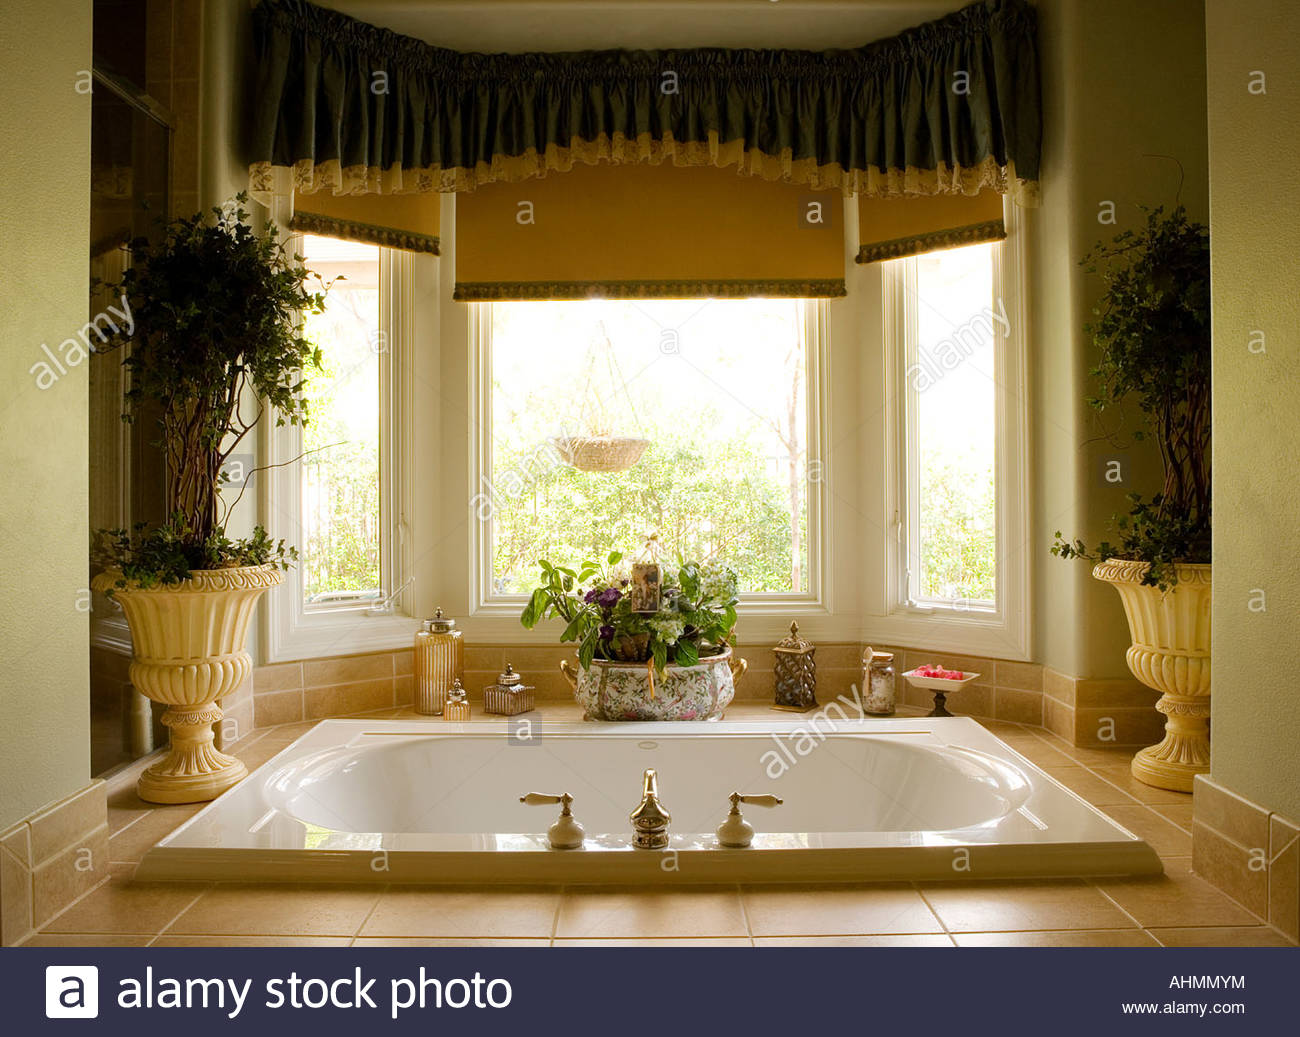 Large Jacuzzi Tub in Master Bathroom Stock Photo: 14507911 - Alamy